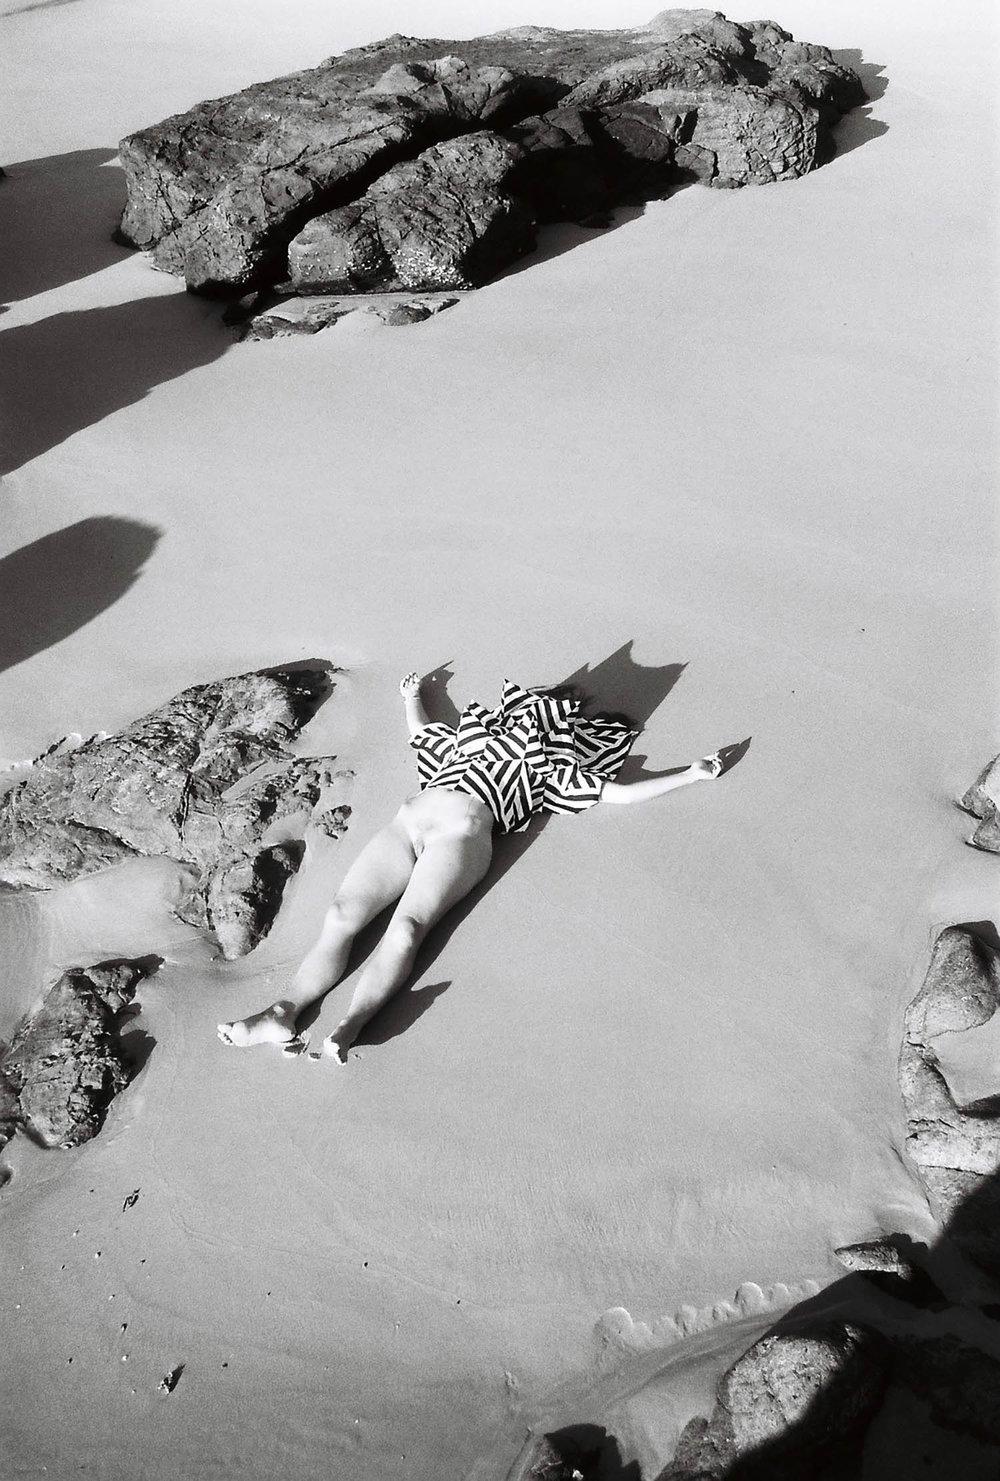 Illusion quilt over me at Coolum beach, 2016, 35mm print (photo Rhett Wyman)